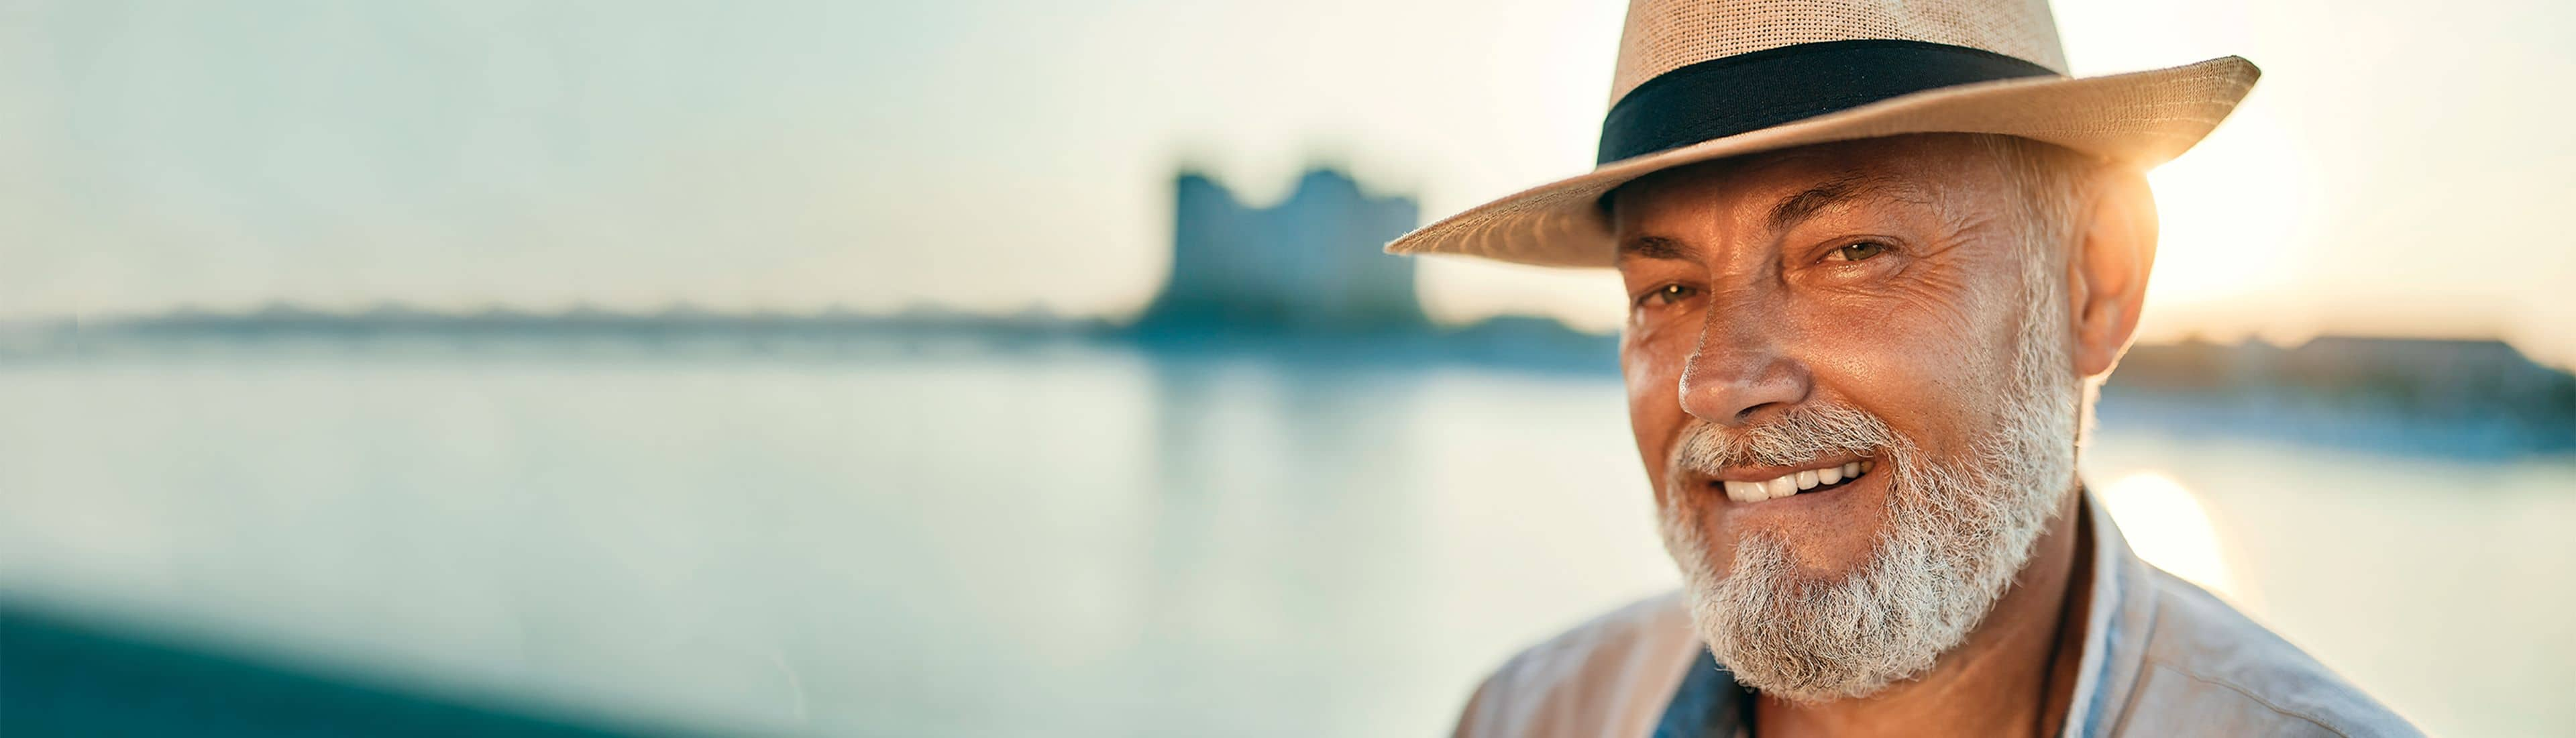 Homepagina banner man met hoed in zomer